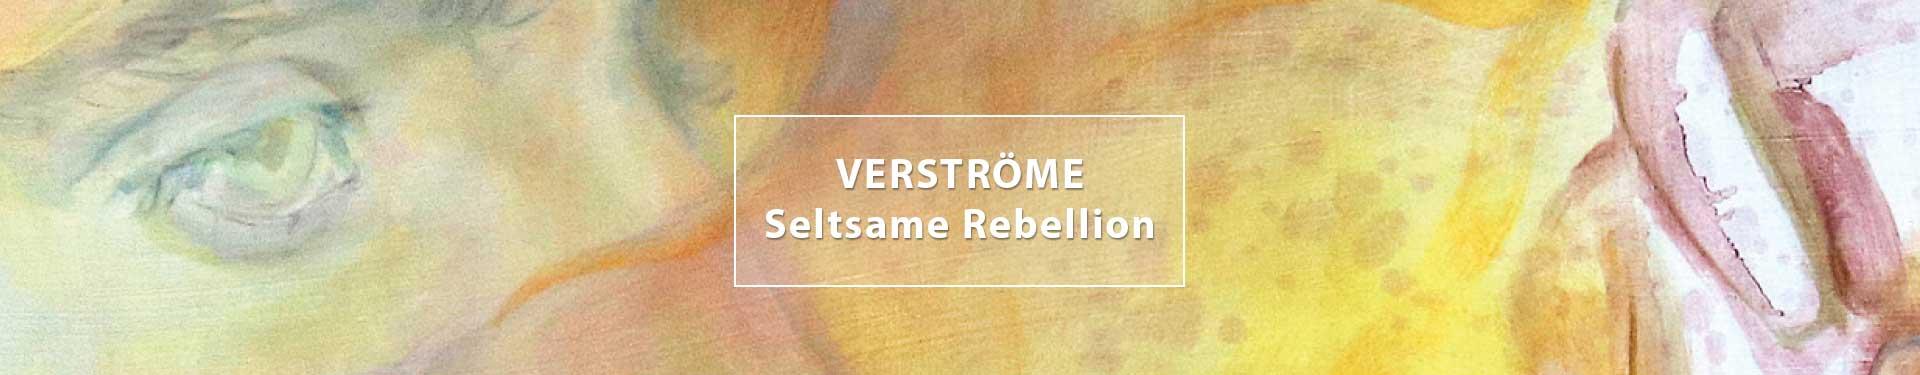 Titelbild: VERSTRÖM, Seltsame Rebellion, Ausstellung